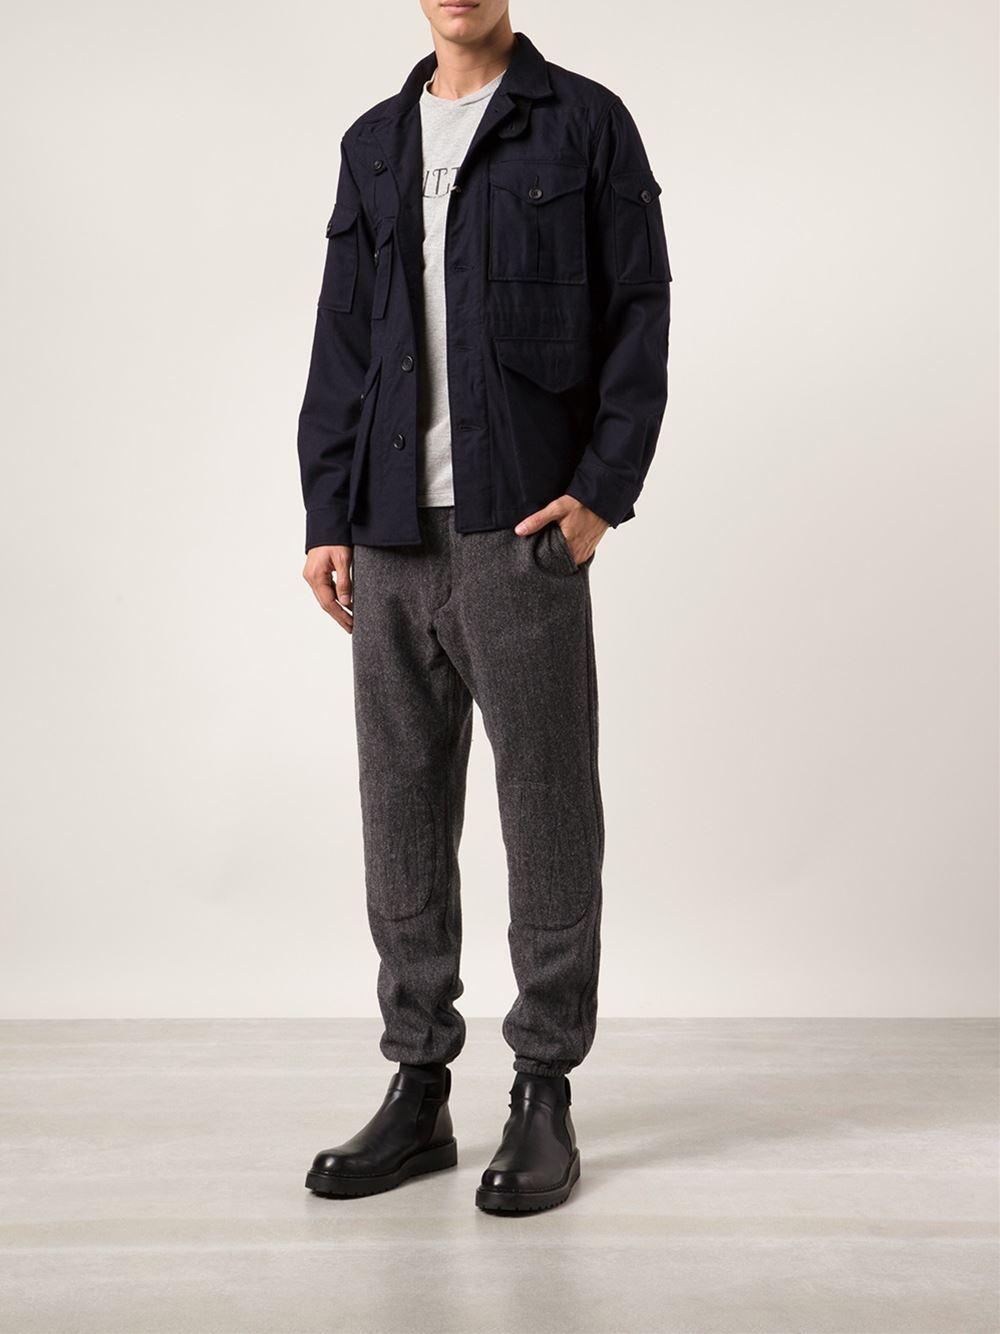 Engineered Garments Herringbone Print Trousers In Gray For Men Lyst